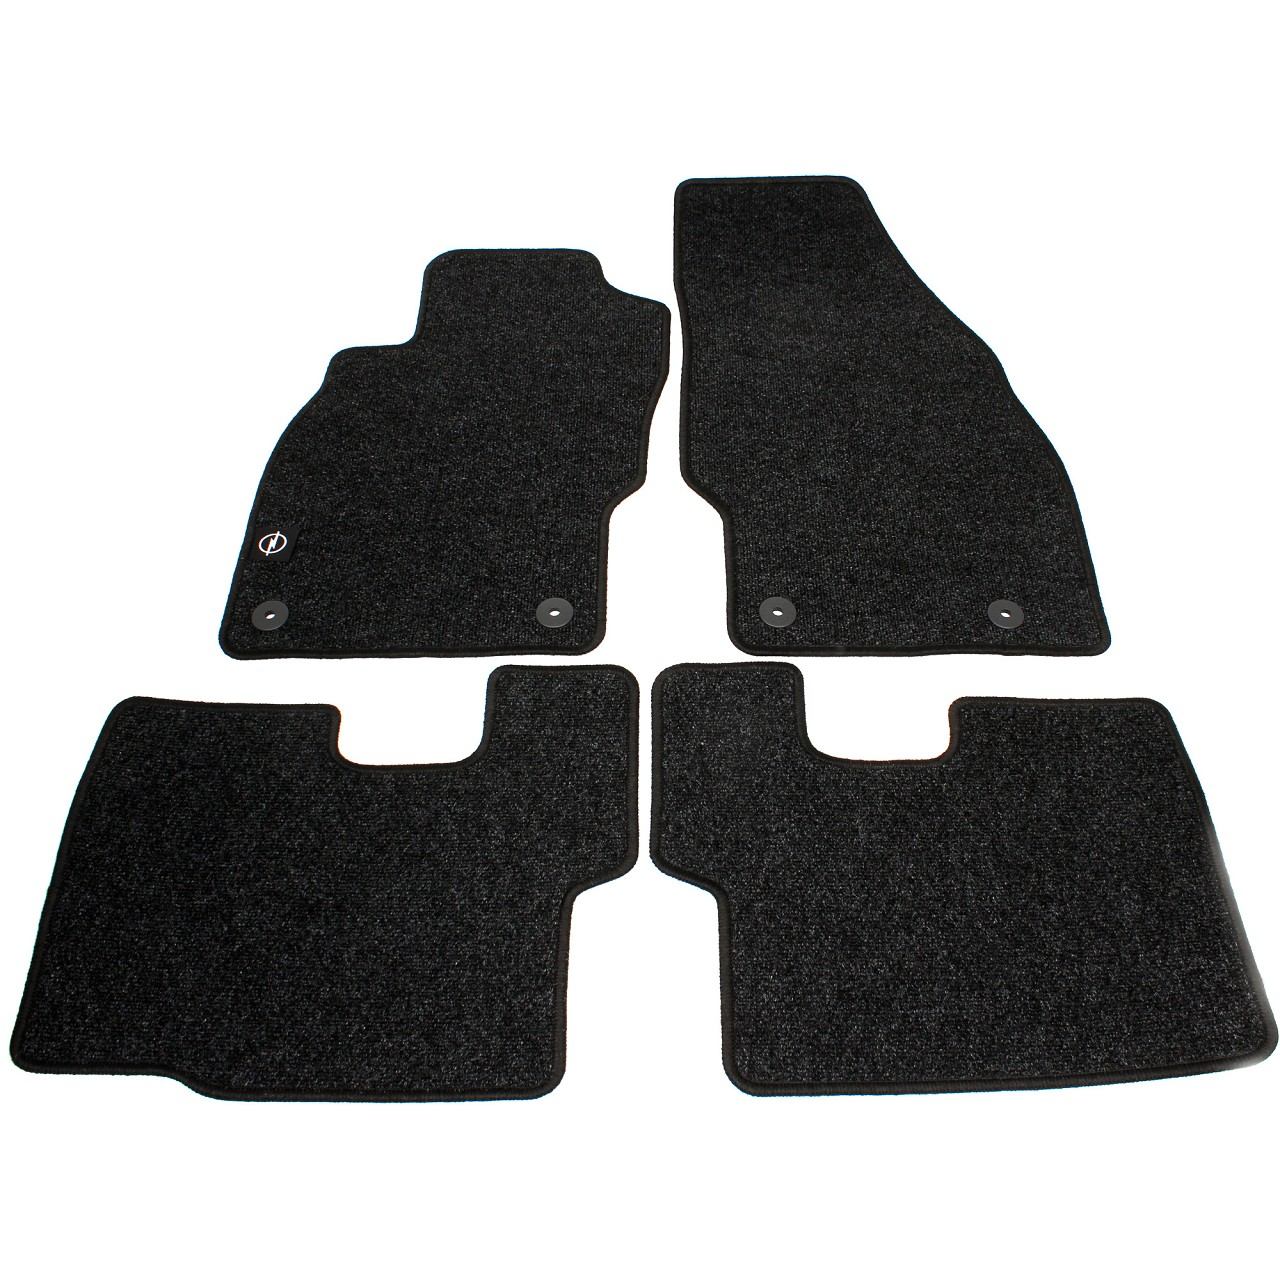 ORIGINAL Opel Textilmatten Fußmatten Automatten Satz Corsa D 4-tlg 1724784